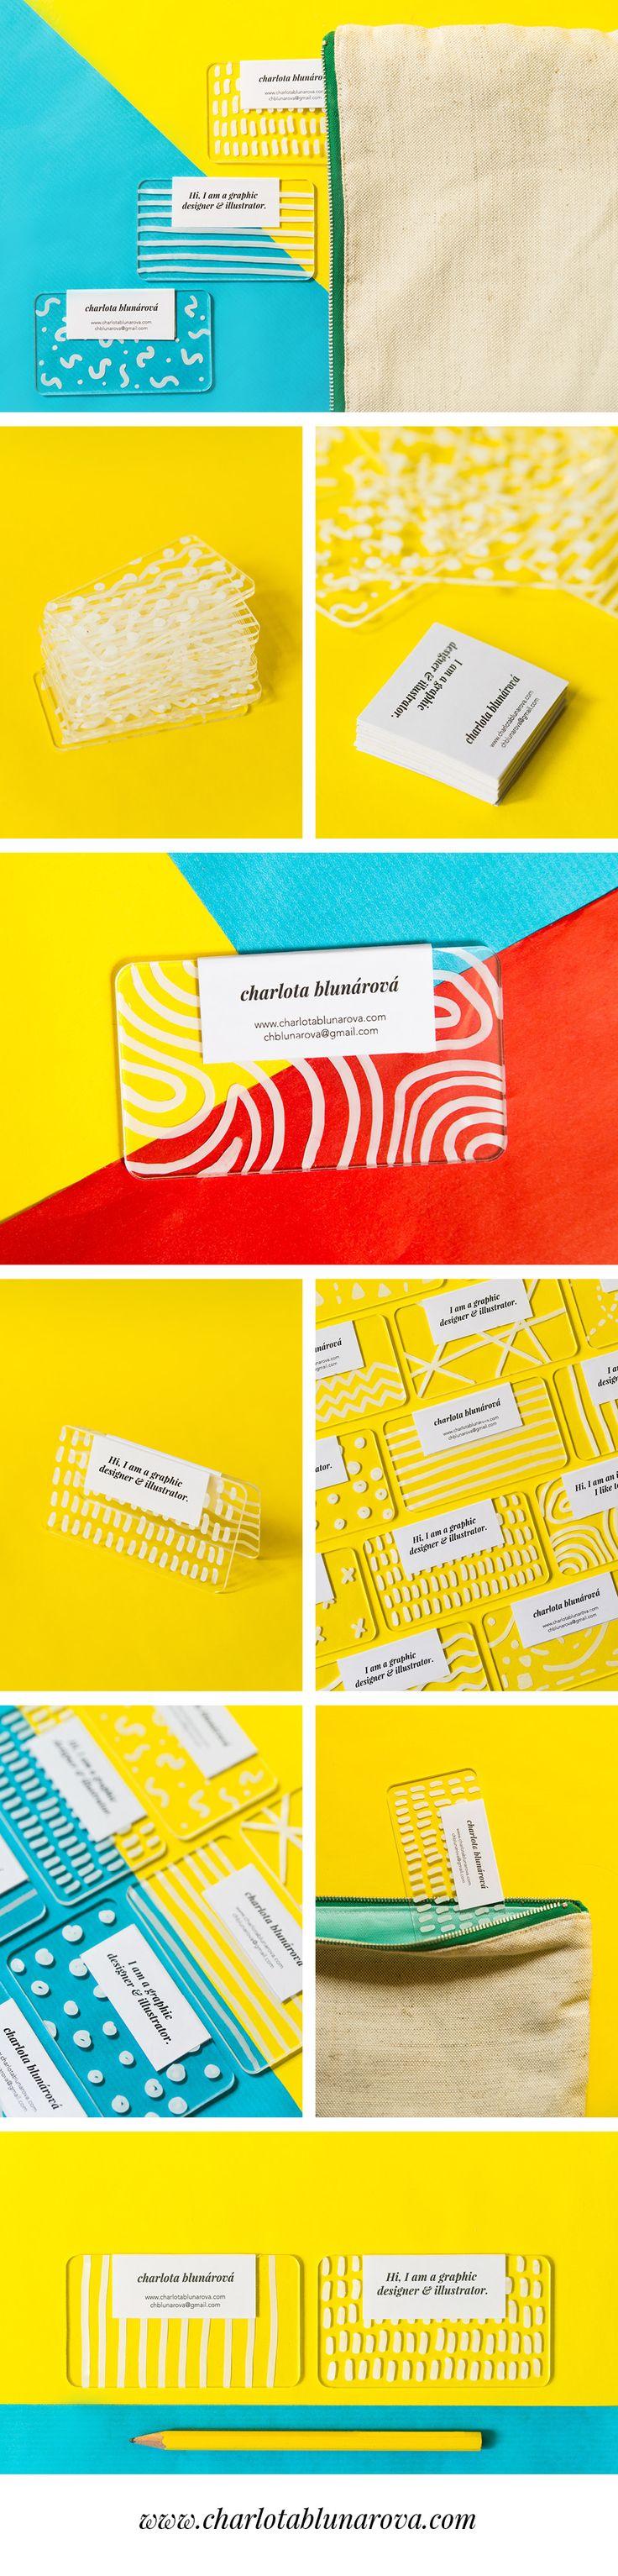 Creative colorful modern plastic business cards by designer Charlota Blunarova. Transparent plexiglass handdrawn with white permanent marker. www.charlotablunarova.com